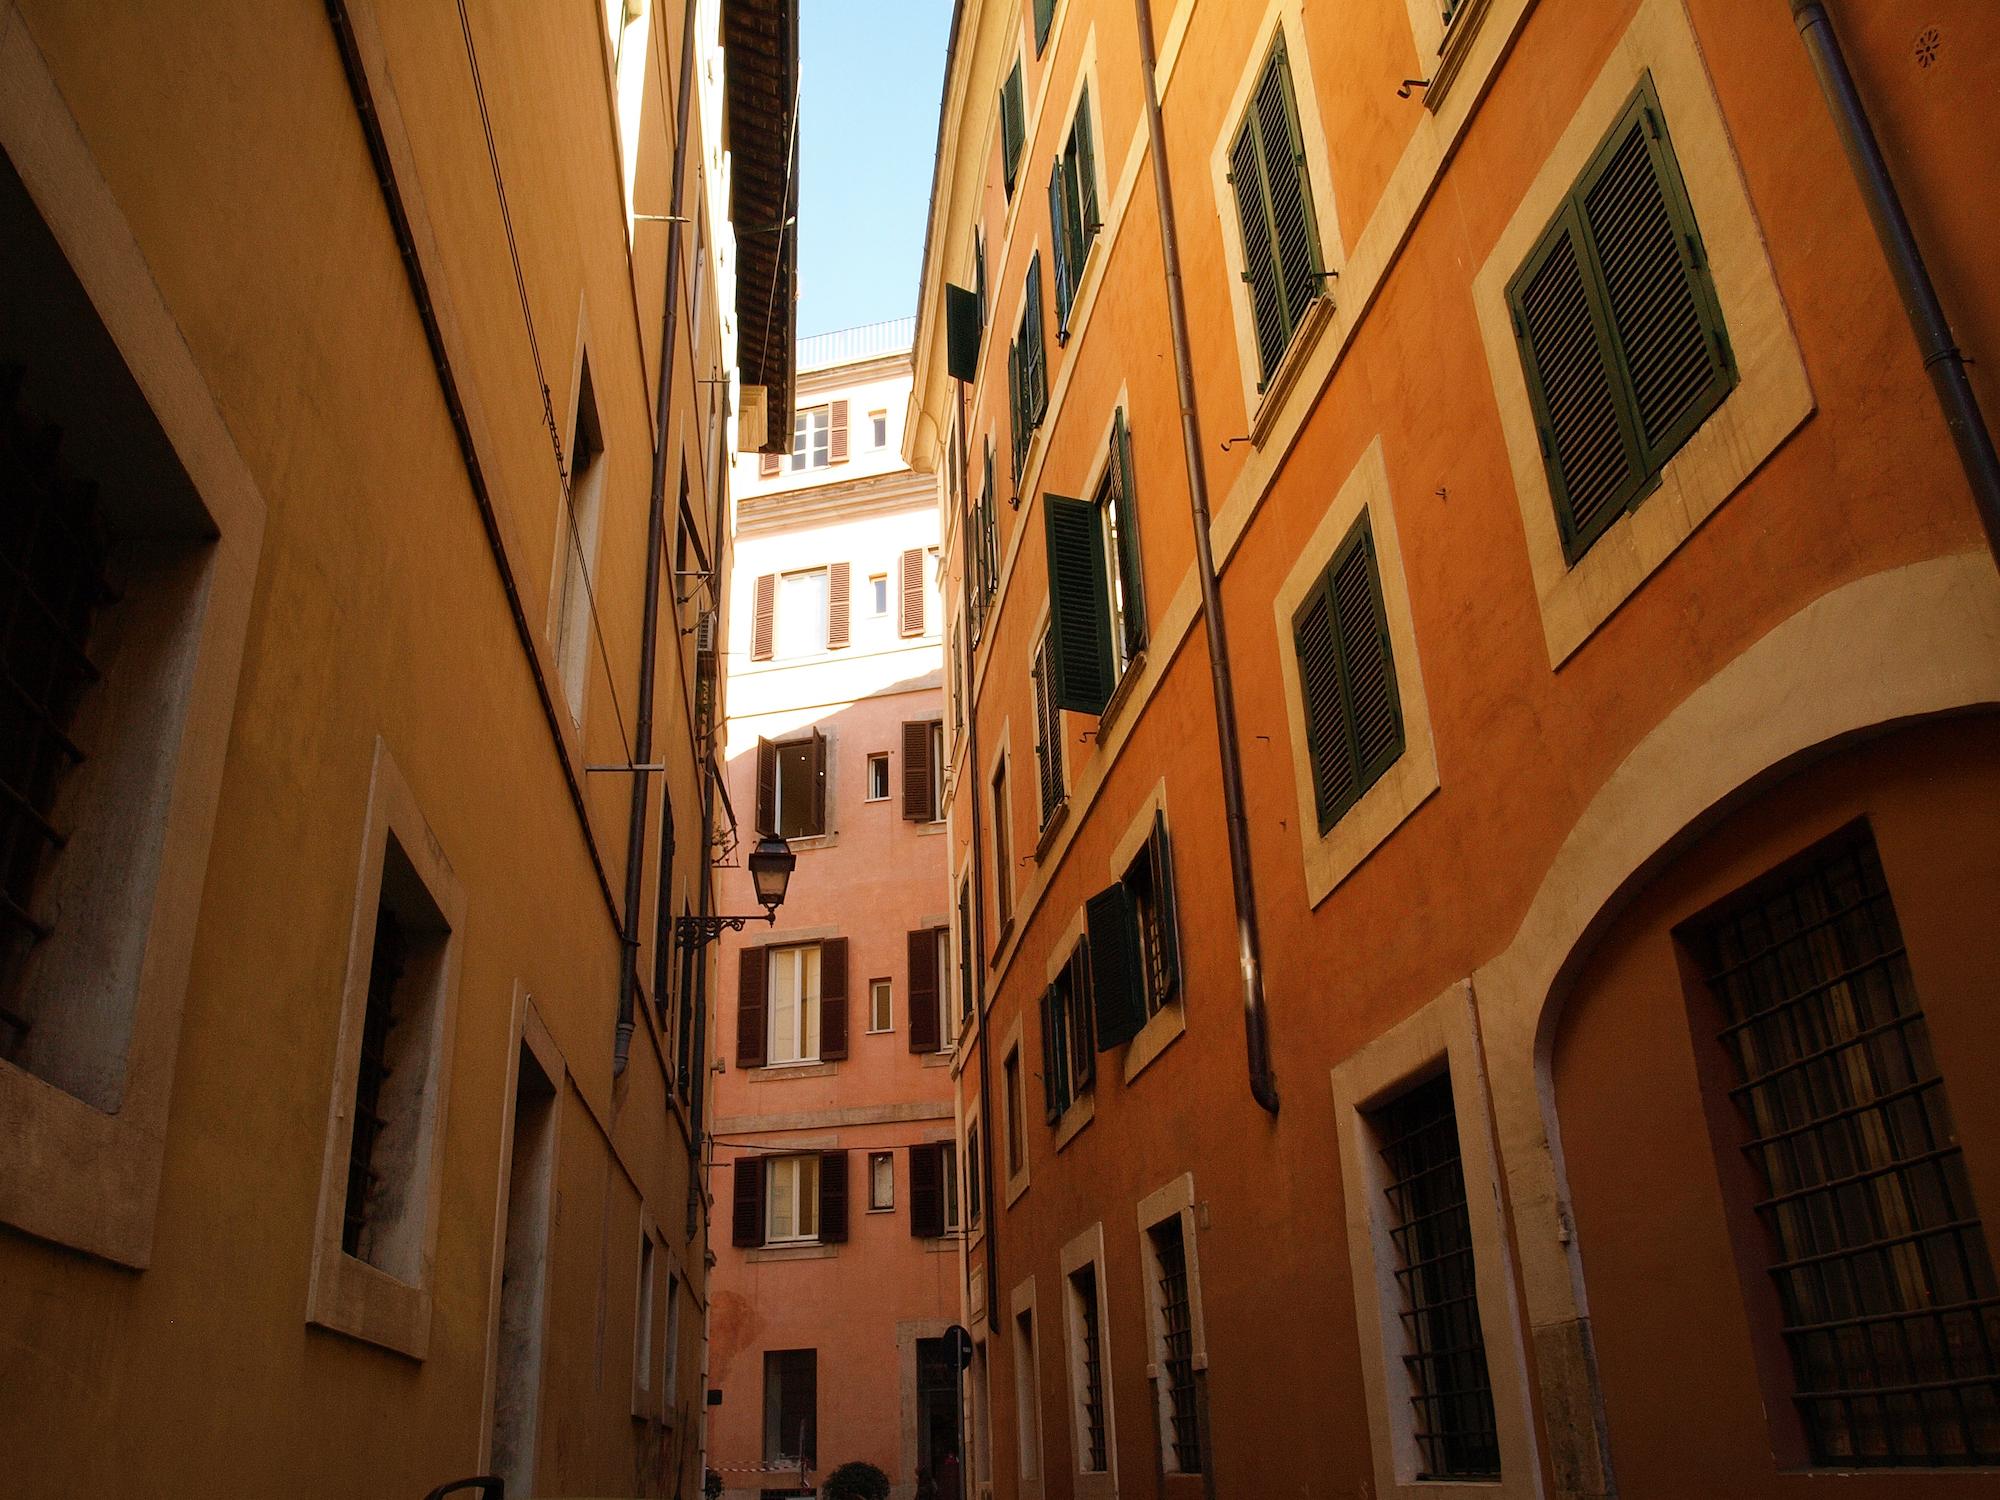 Via della Penna in Rome, Italy. Travel photography by Geena Matuson @geenamatuson #thegirlmirage.